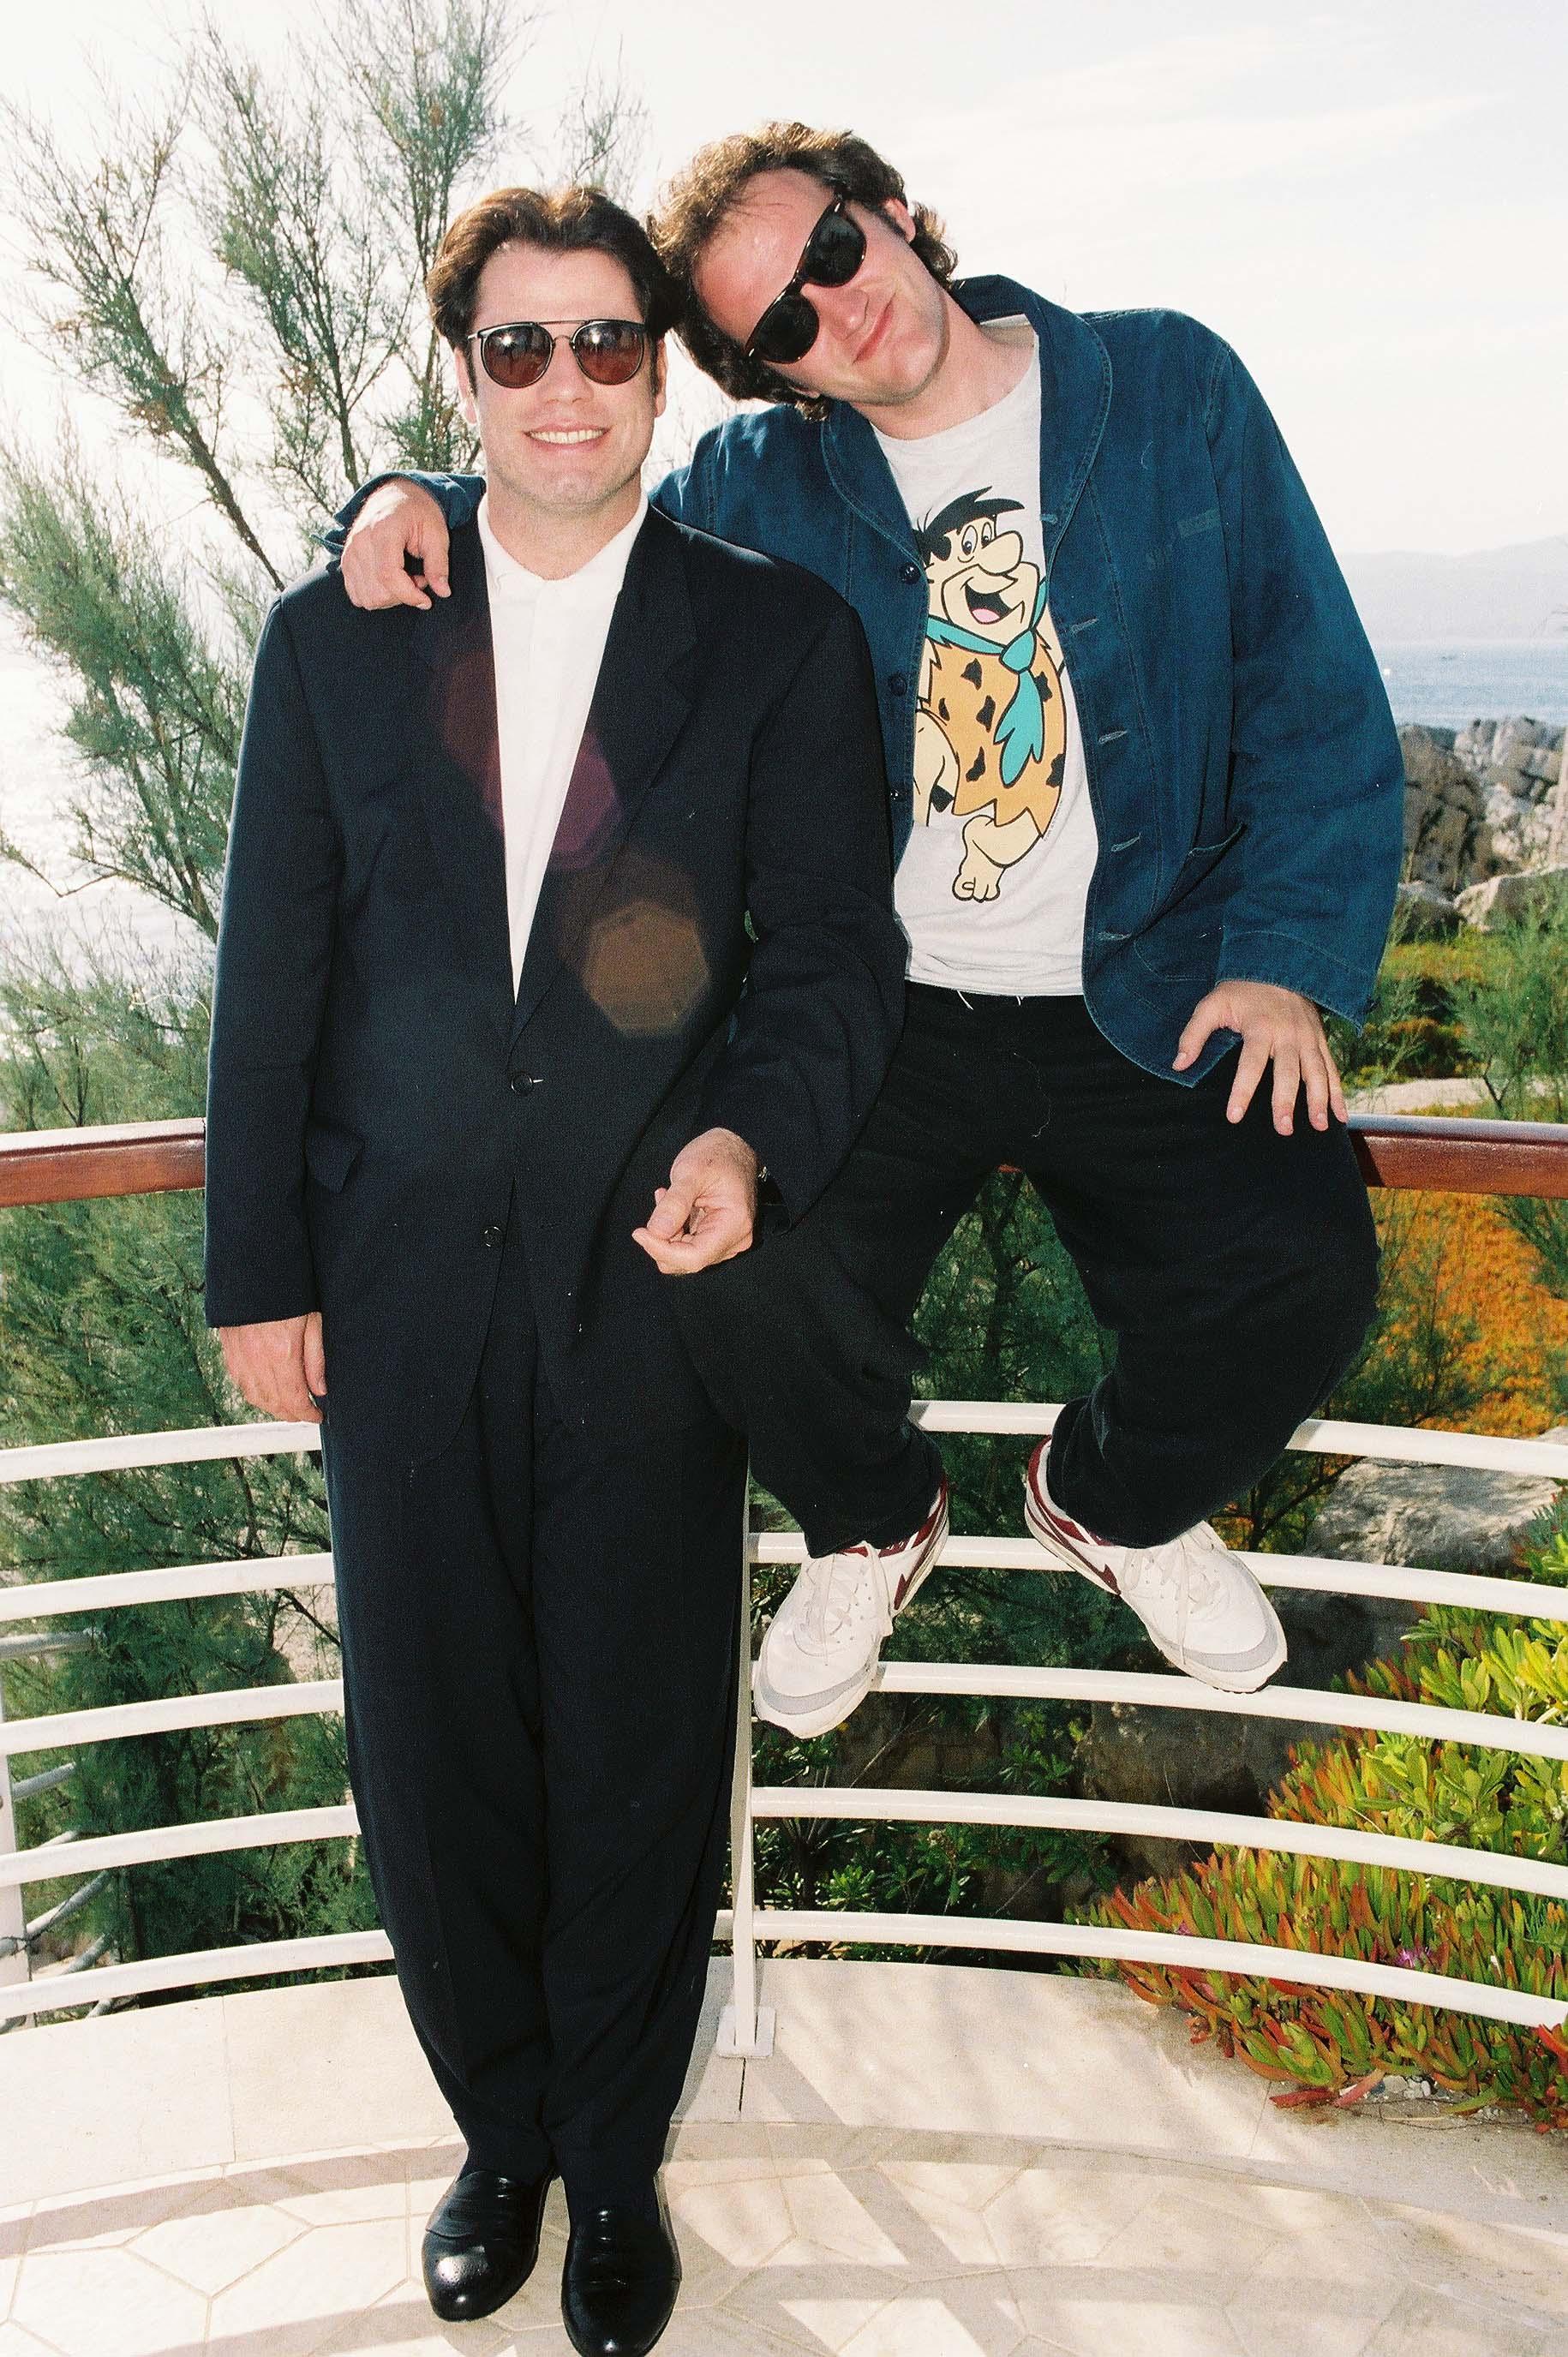 The Cannes Film Festival 1994 Pulp Fiction John Travolta & Quentin TarantinoThe Cannes Film Festival